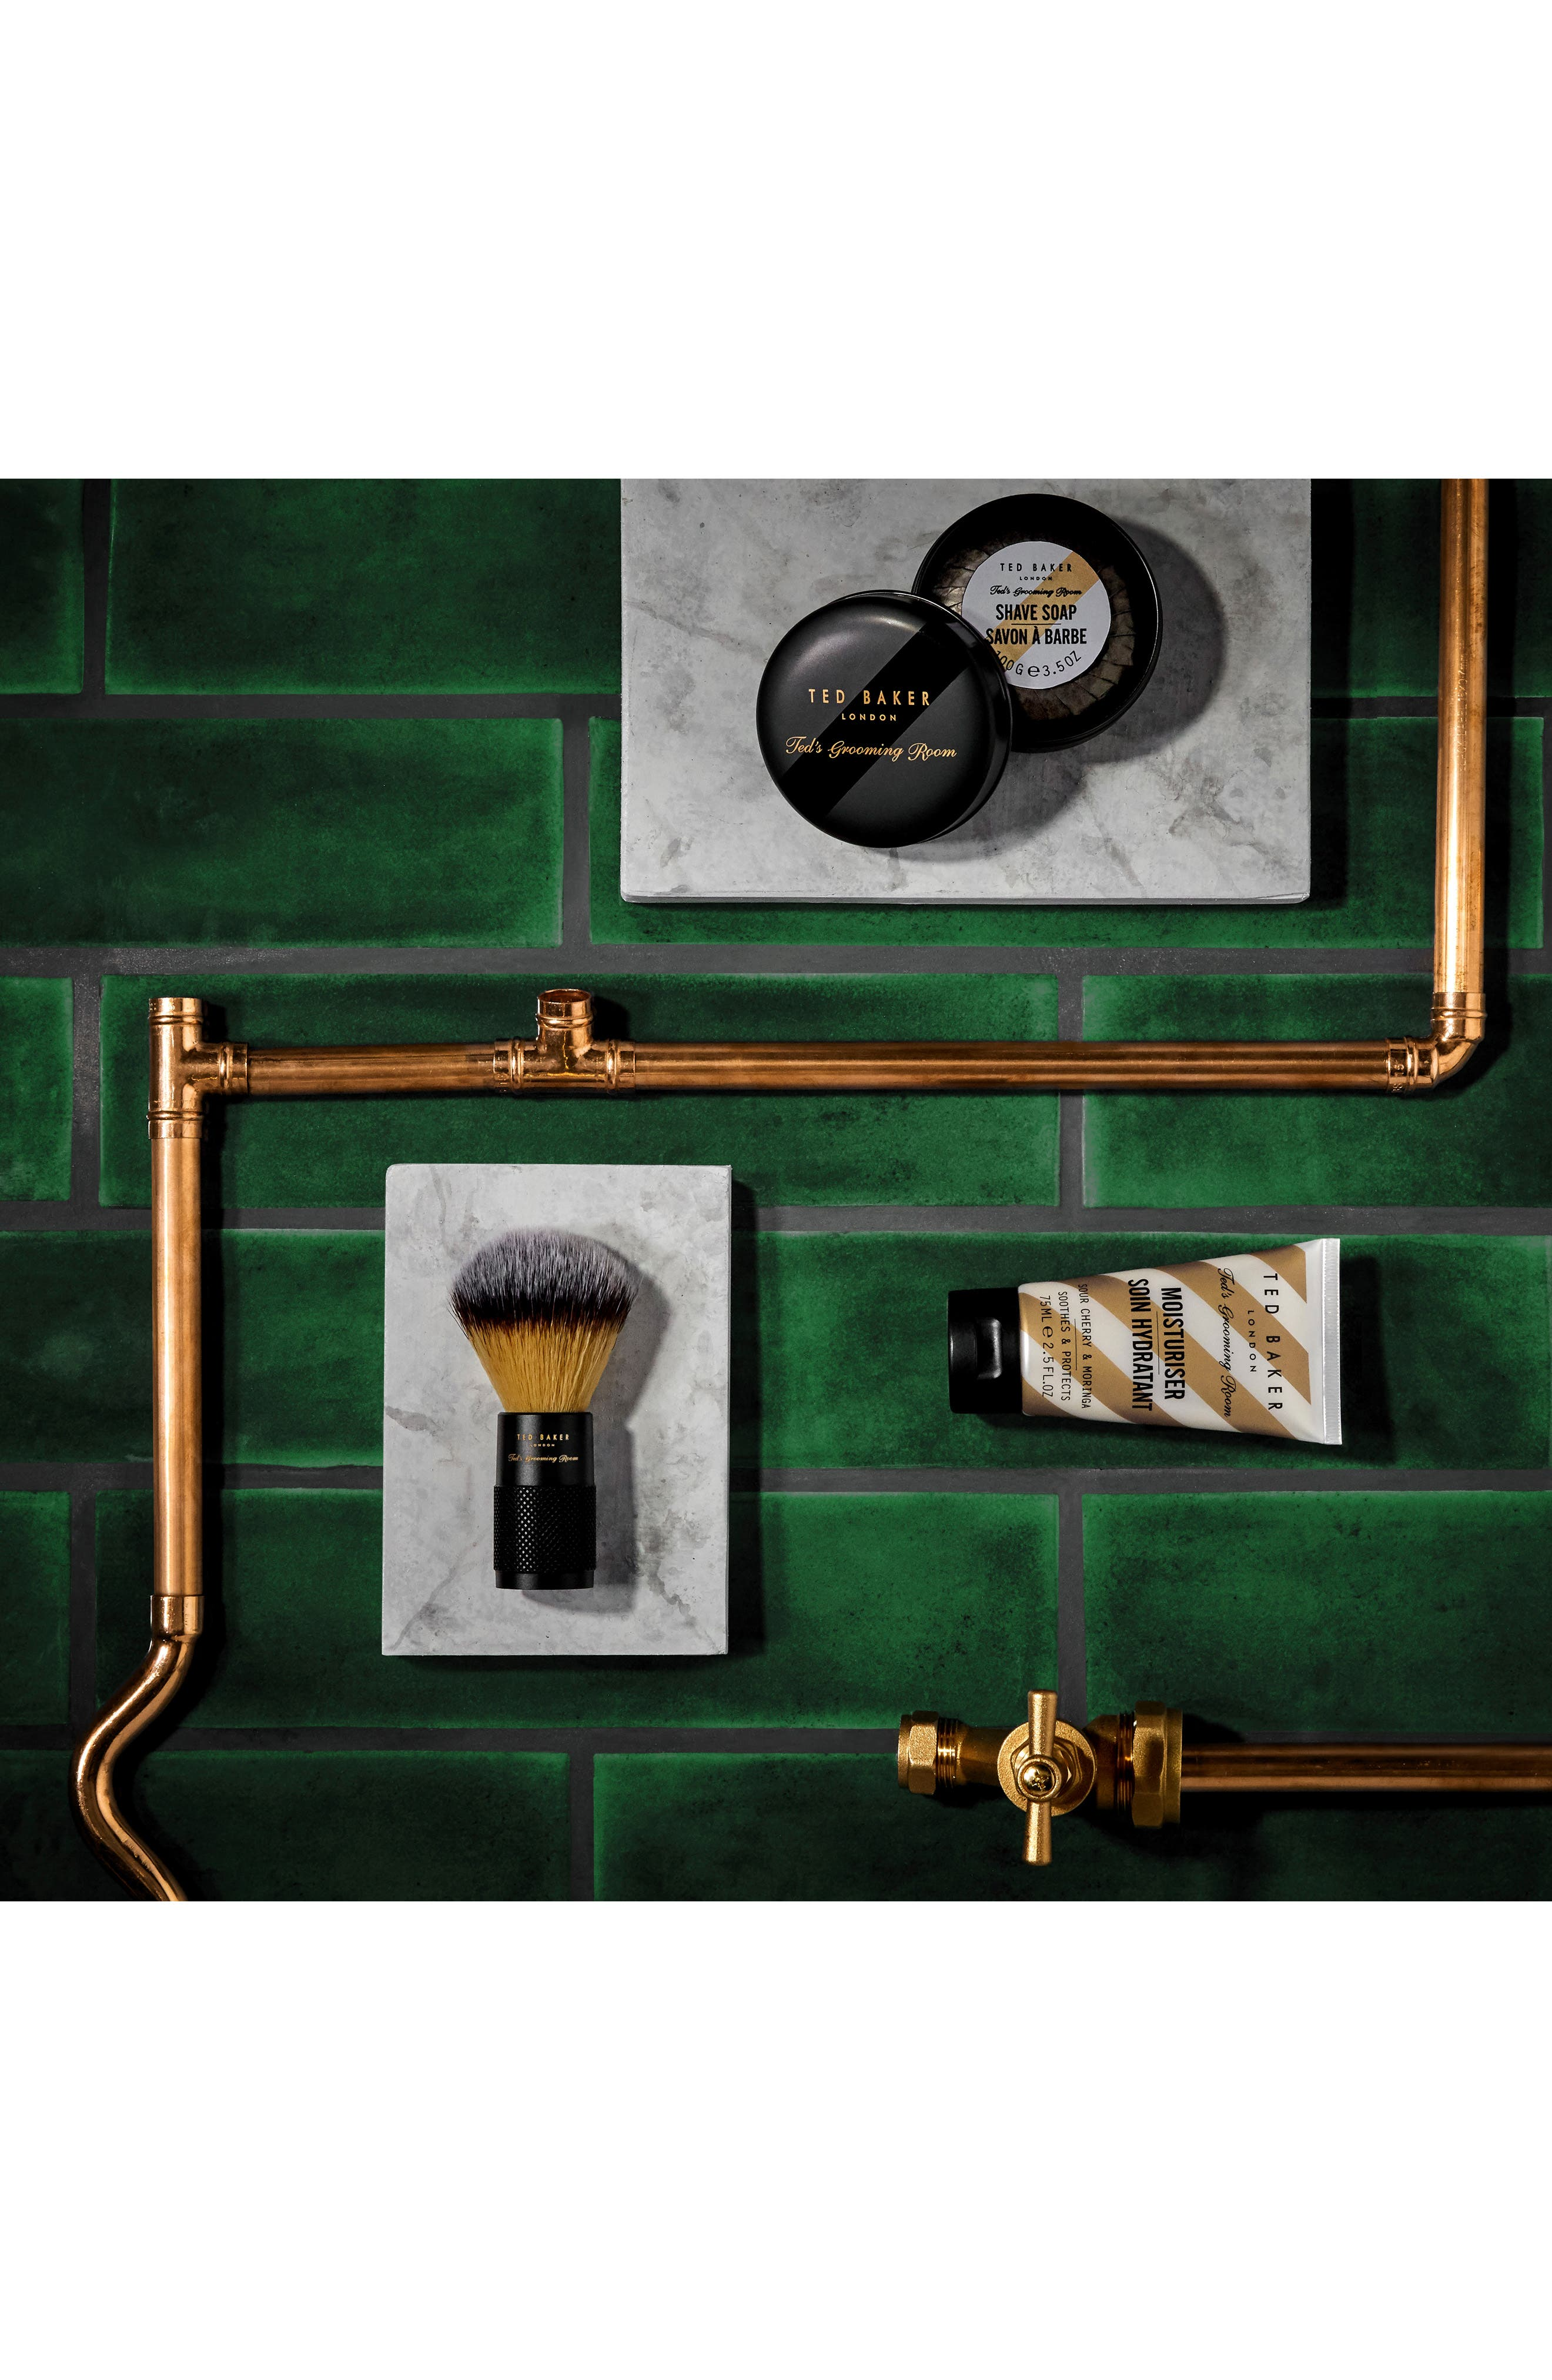 TED BAKER LONDON,                             Ted's Grooming Room Moisturizer,                             Alternate thumbnail 4, color,                             000